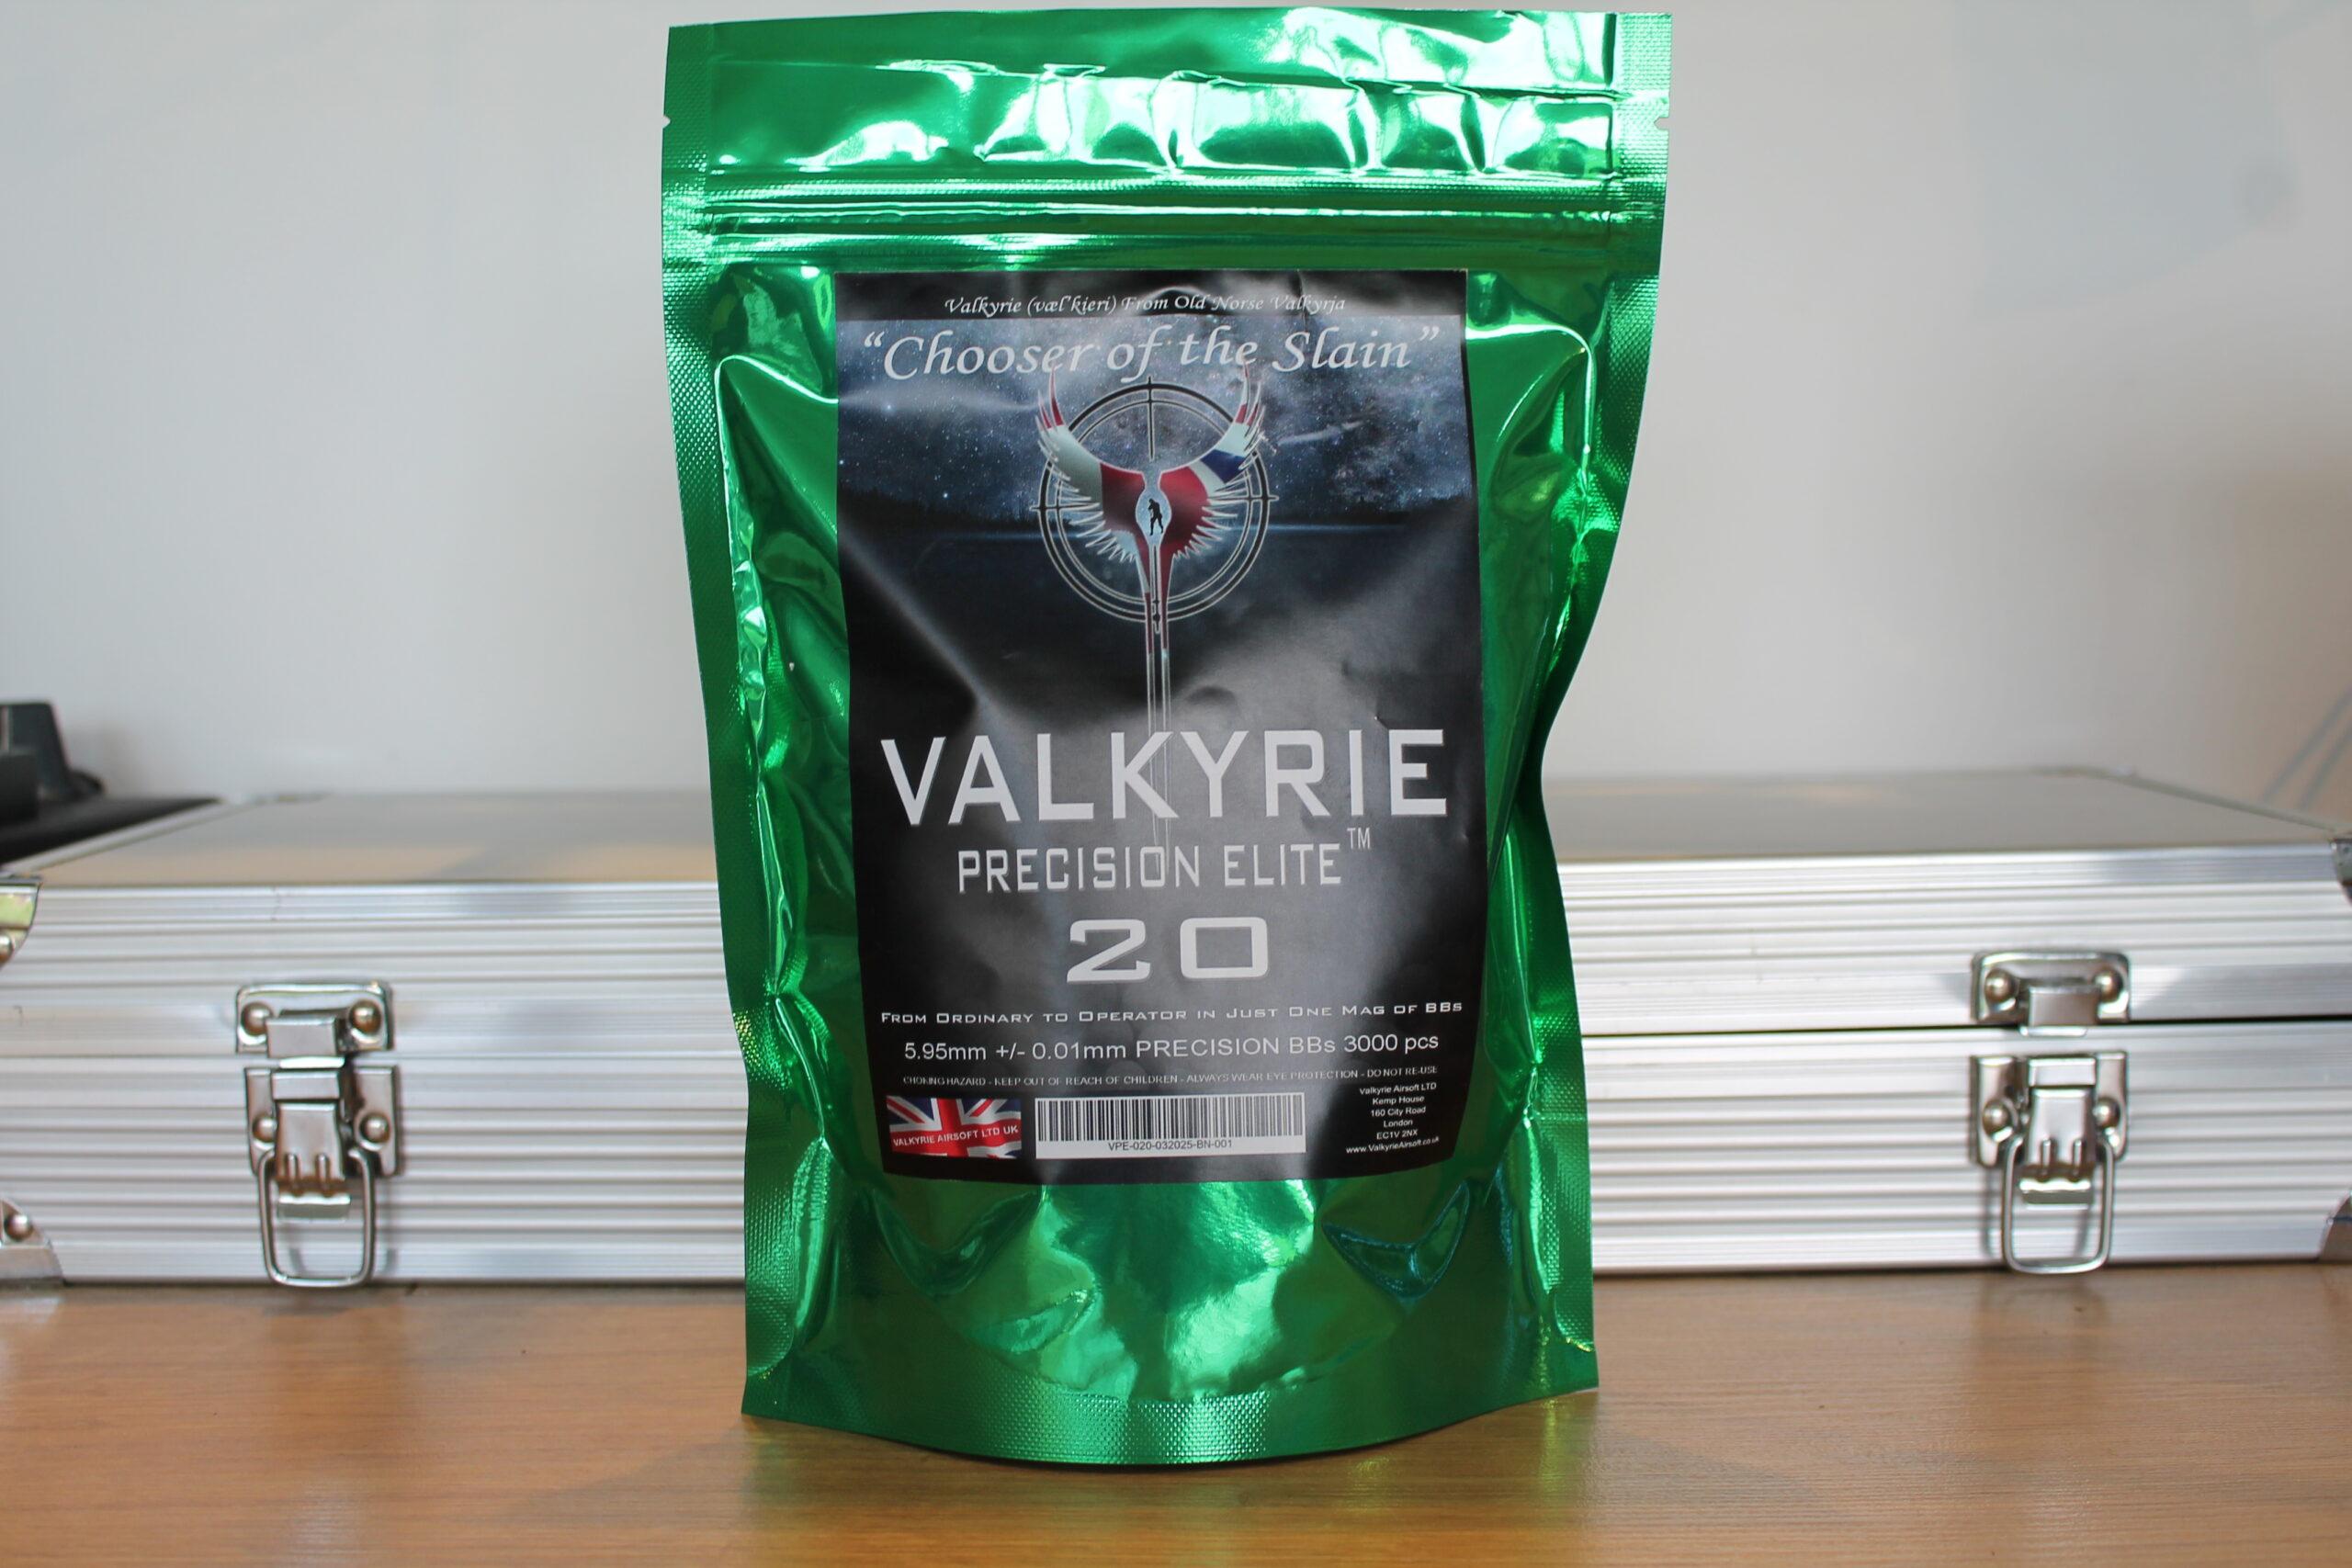 Bulk Buy Valkyrie Precision Elite 20s Premium BBs